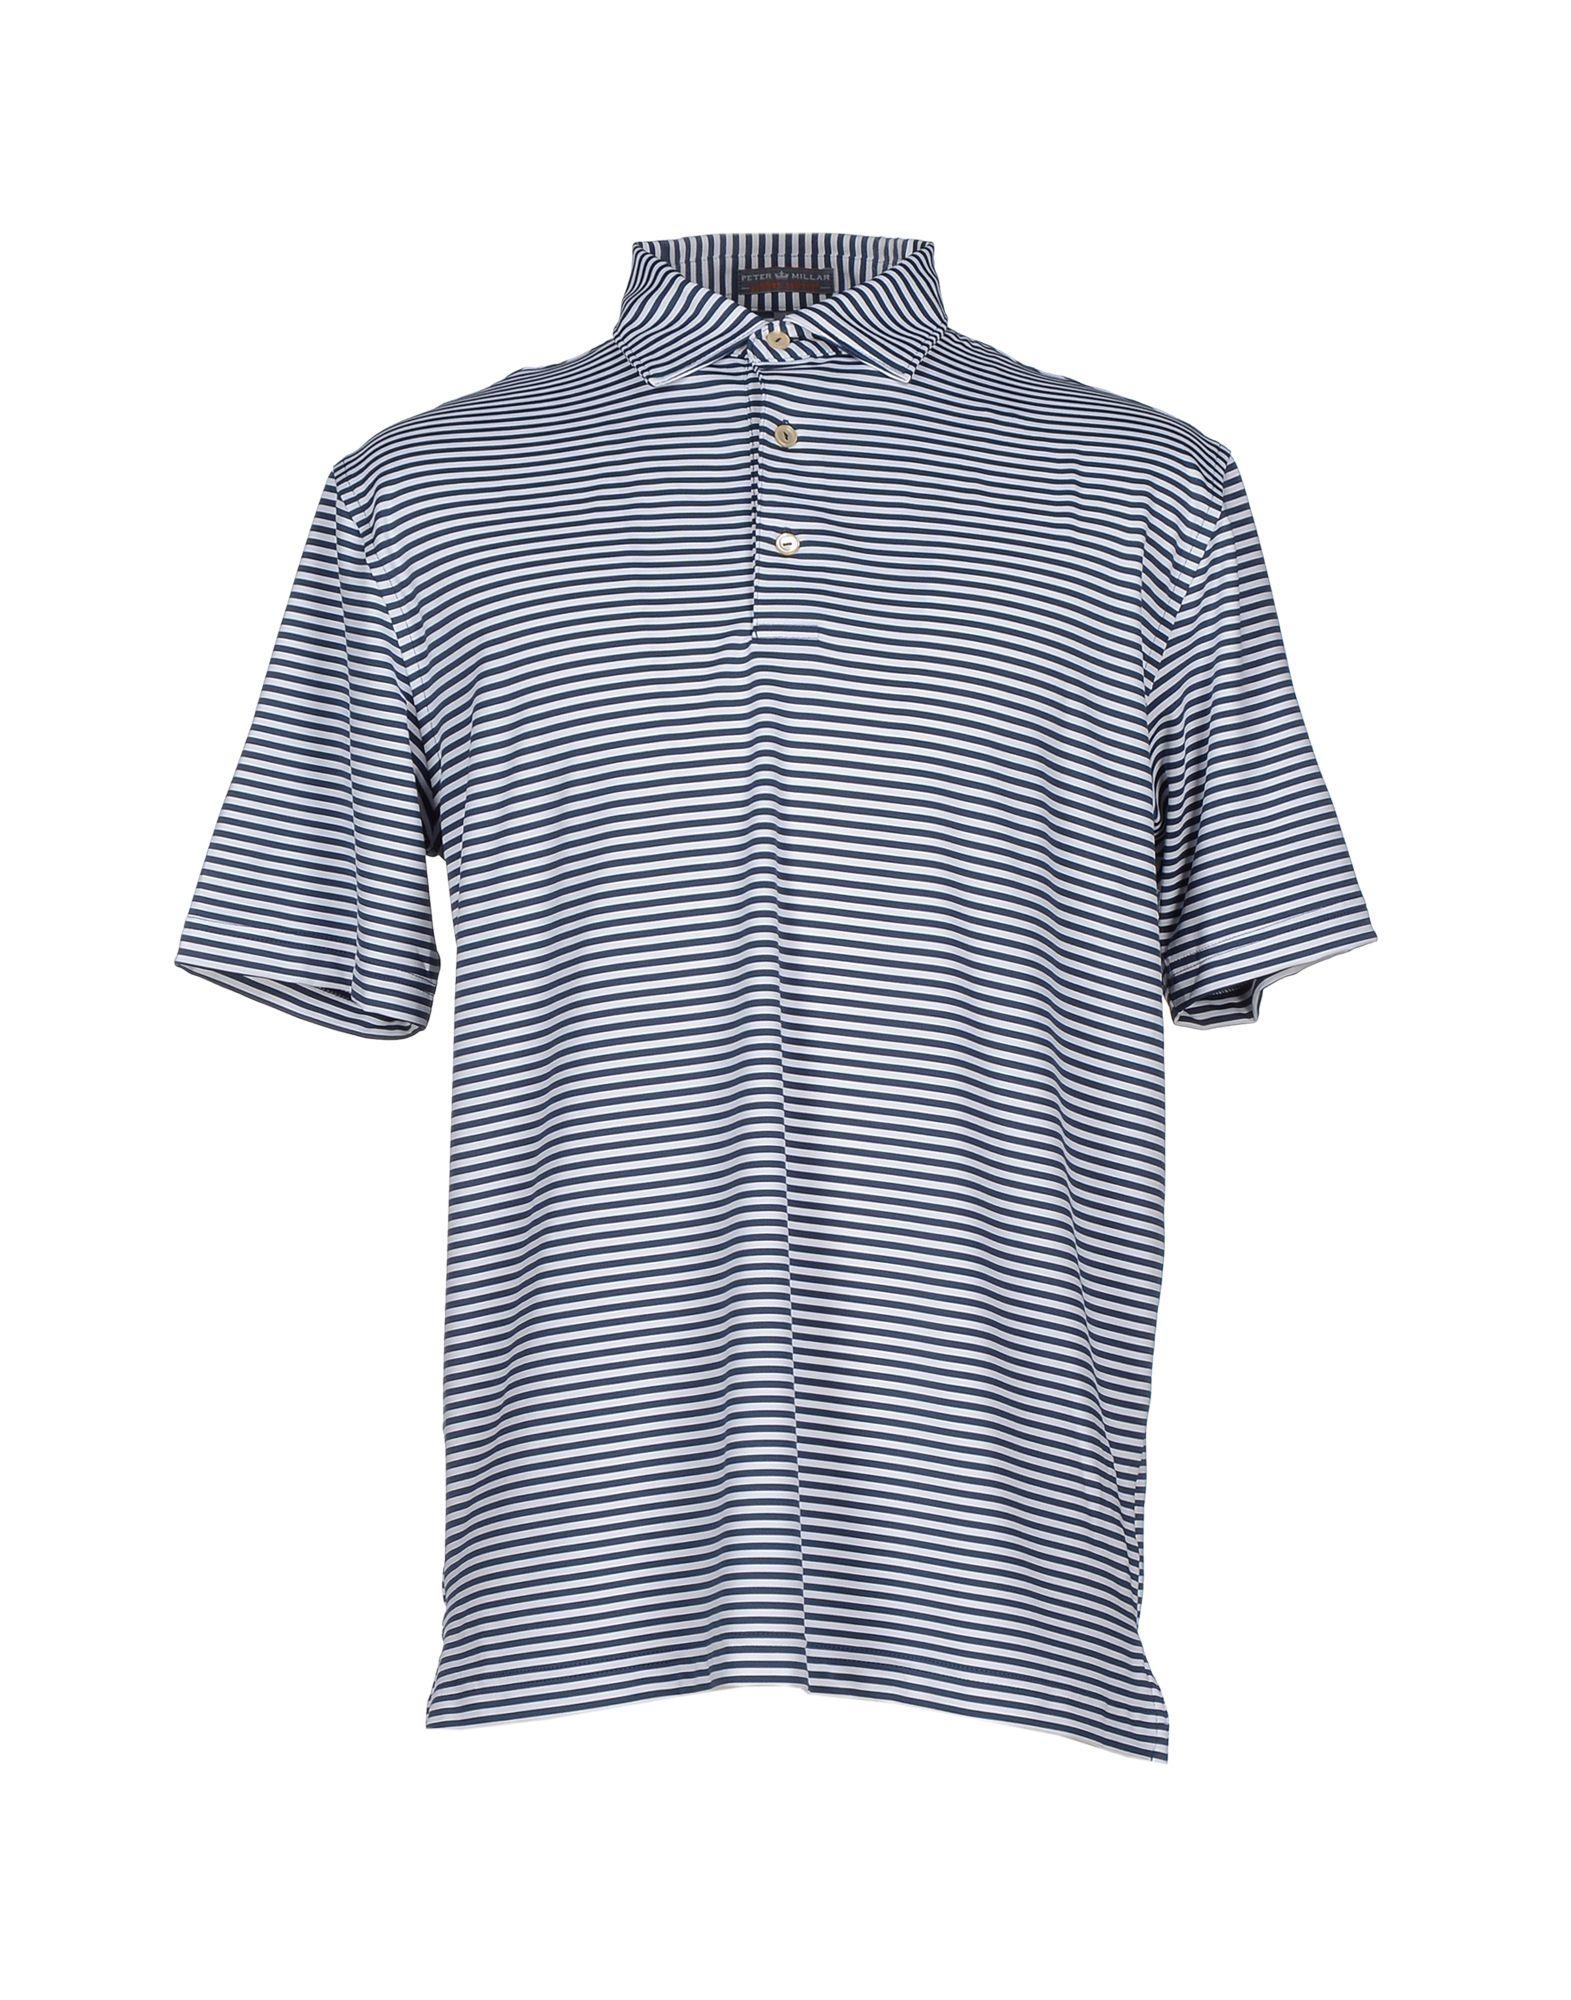 Peter millar polo shirt in blue for men lyst for Peter millar polo shirts